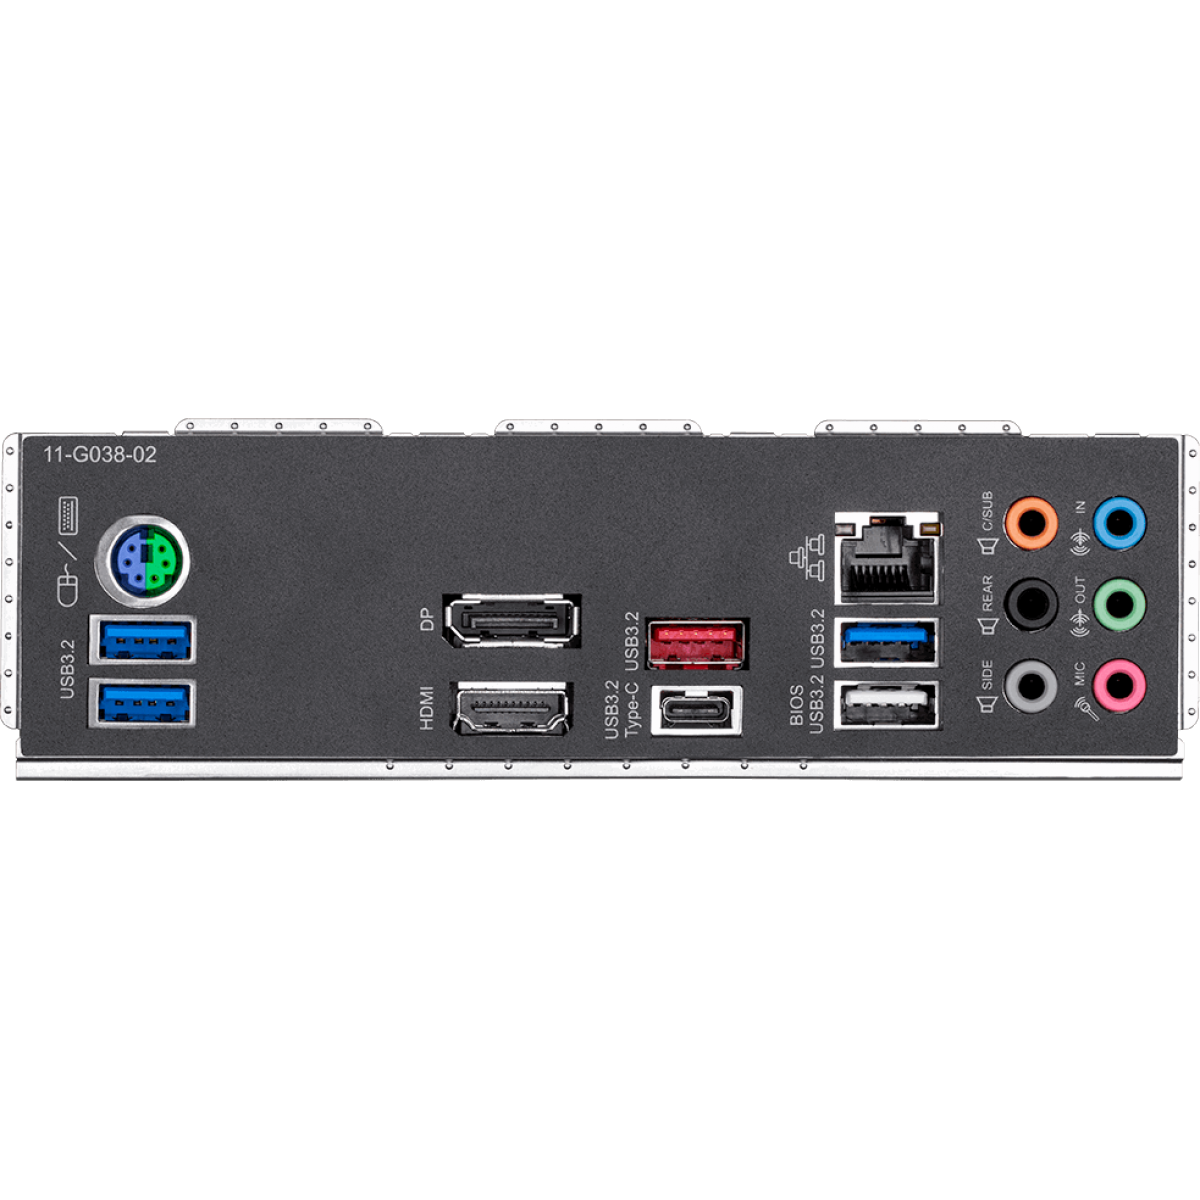 Placa Mãe Gigabyte Z490M Gaming X 1.0 Chipset Z490, Intel LGA 1200, mATX, DDR4